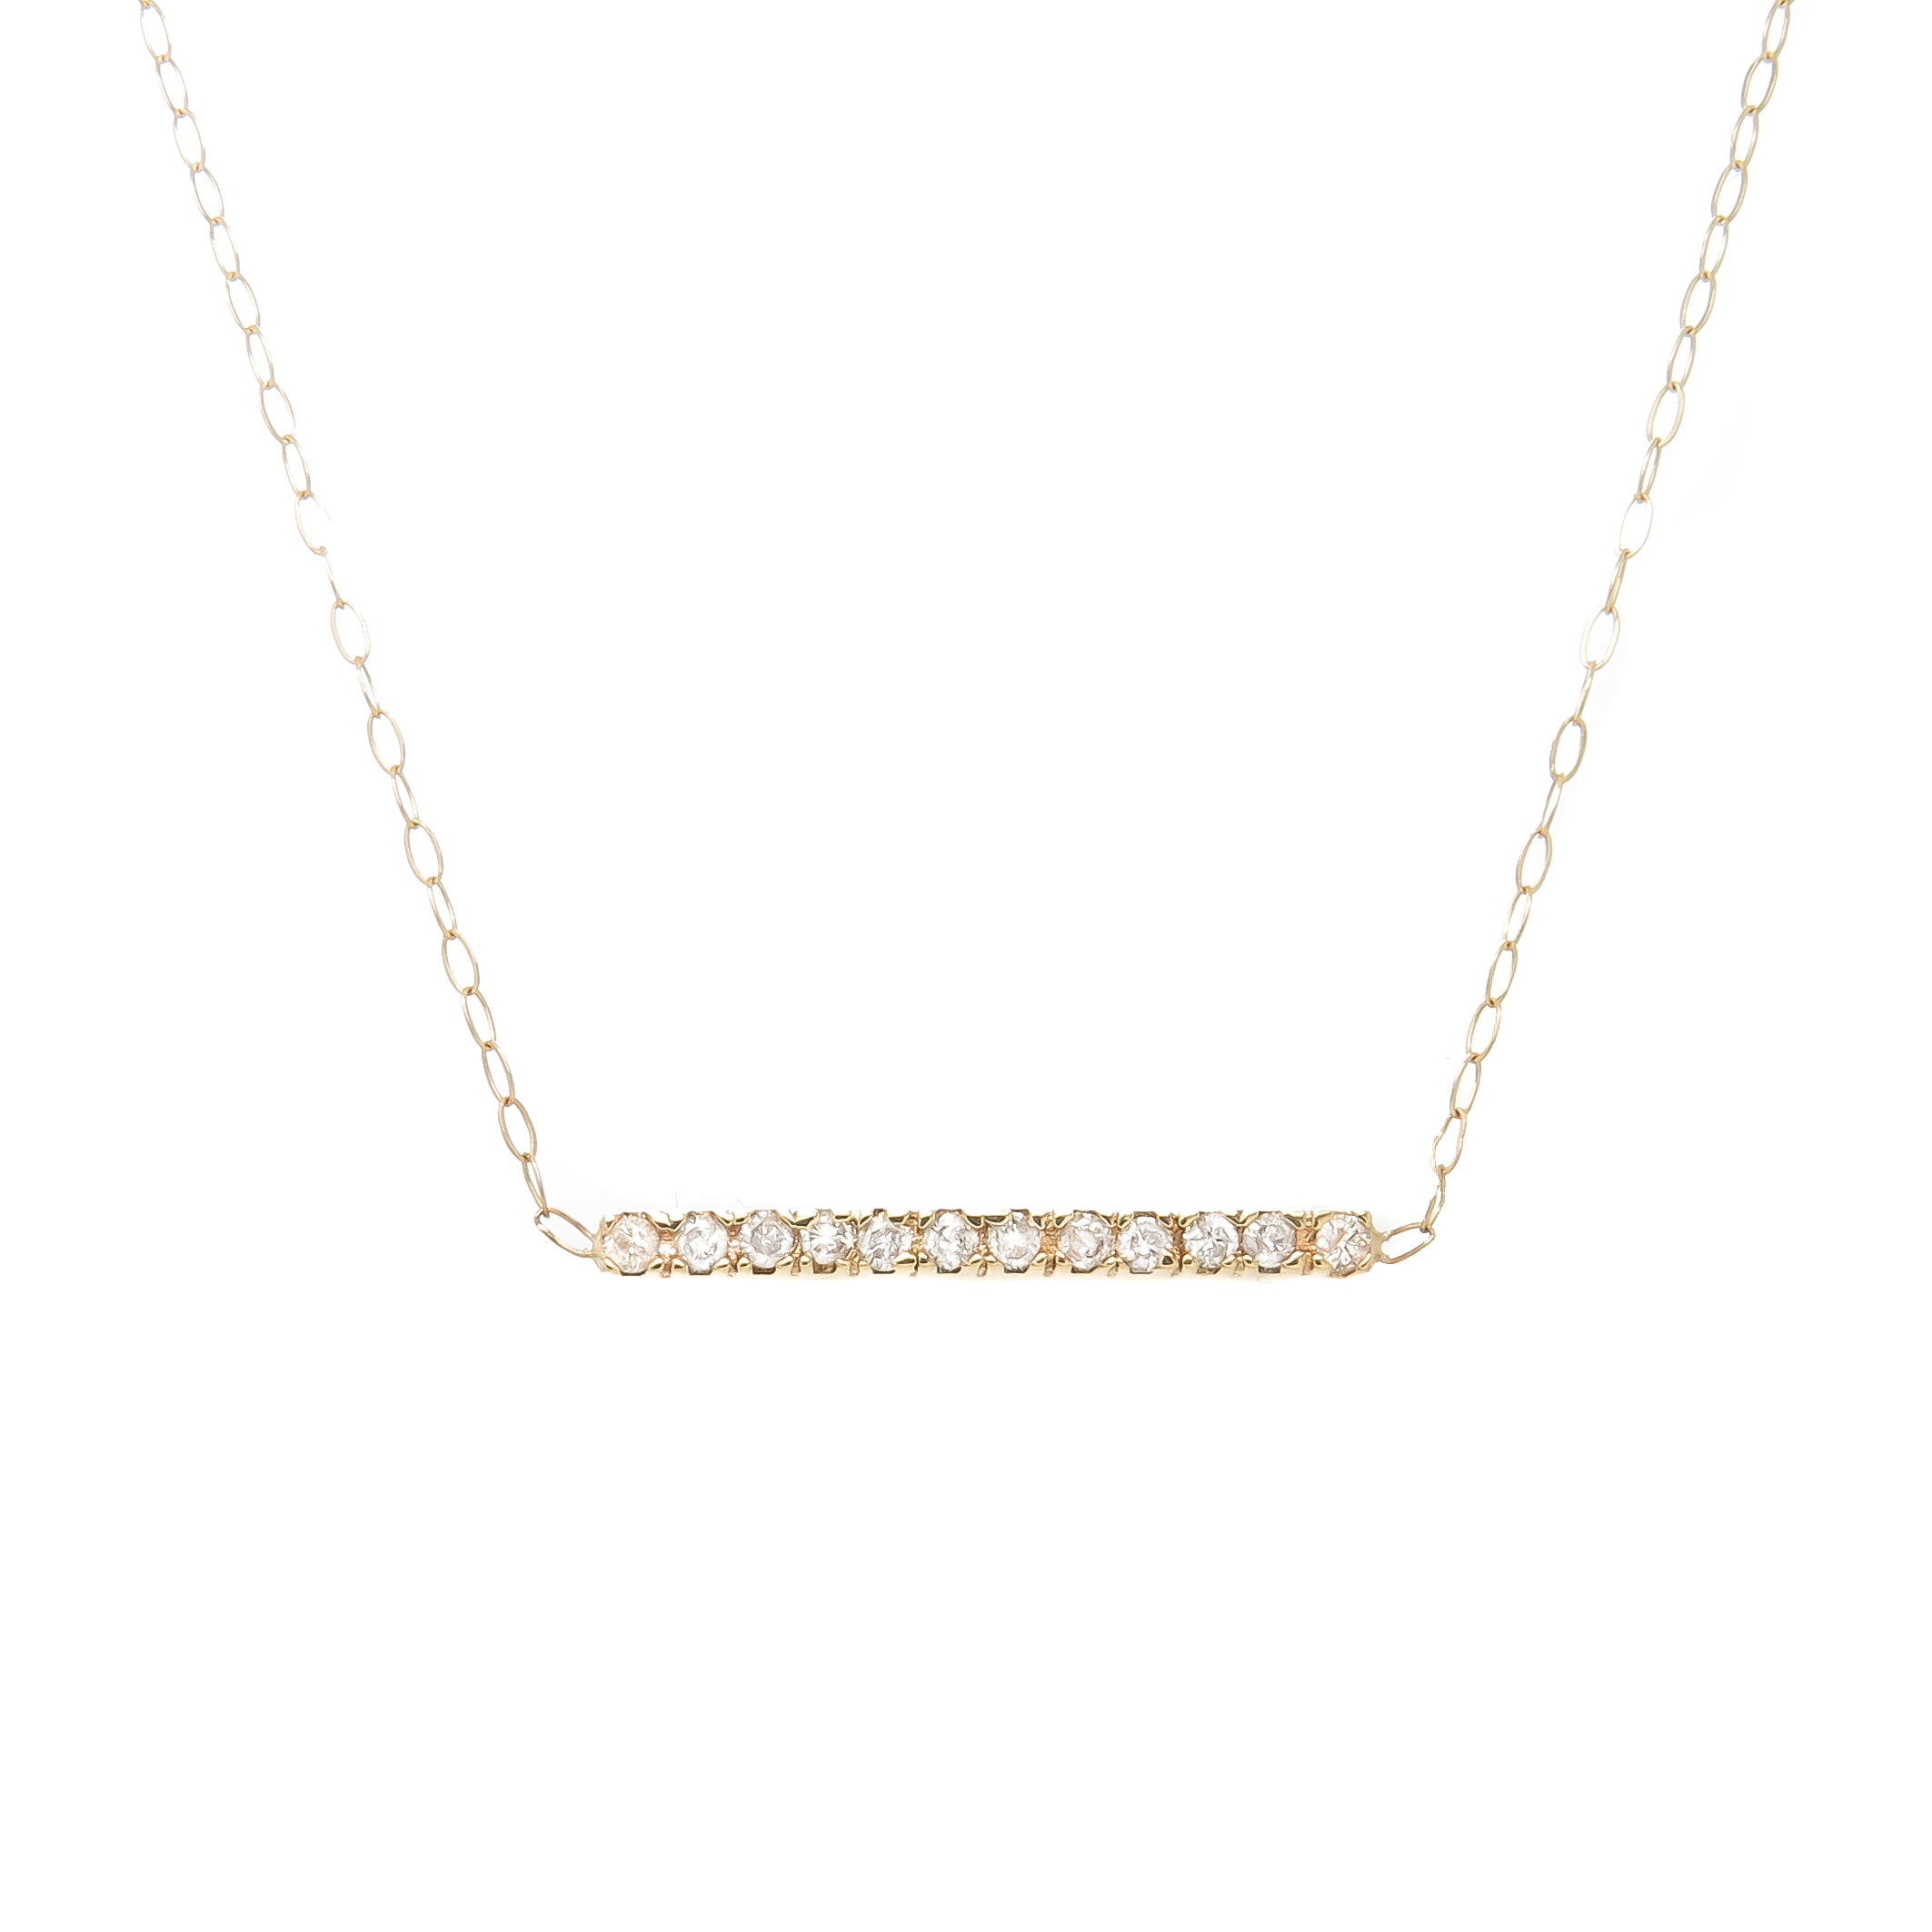 diamond bar necklace by kerry gilligan layering 14k gold.jpg